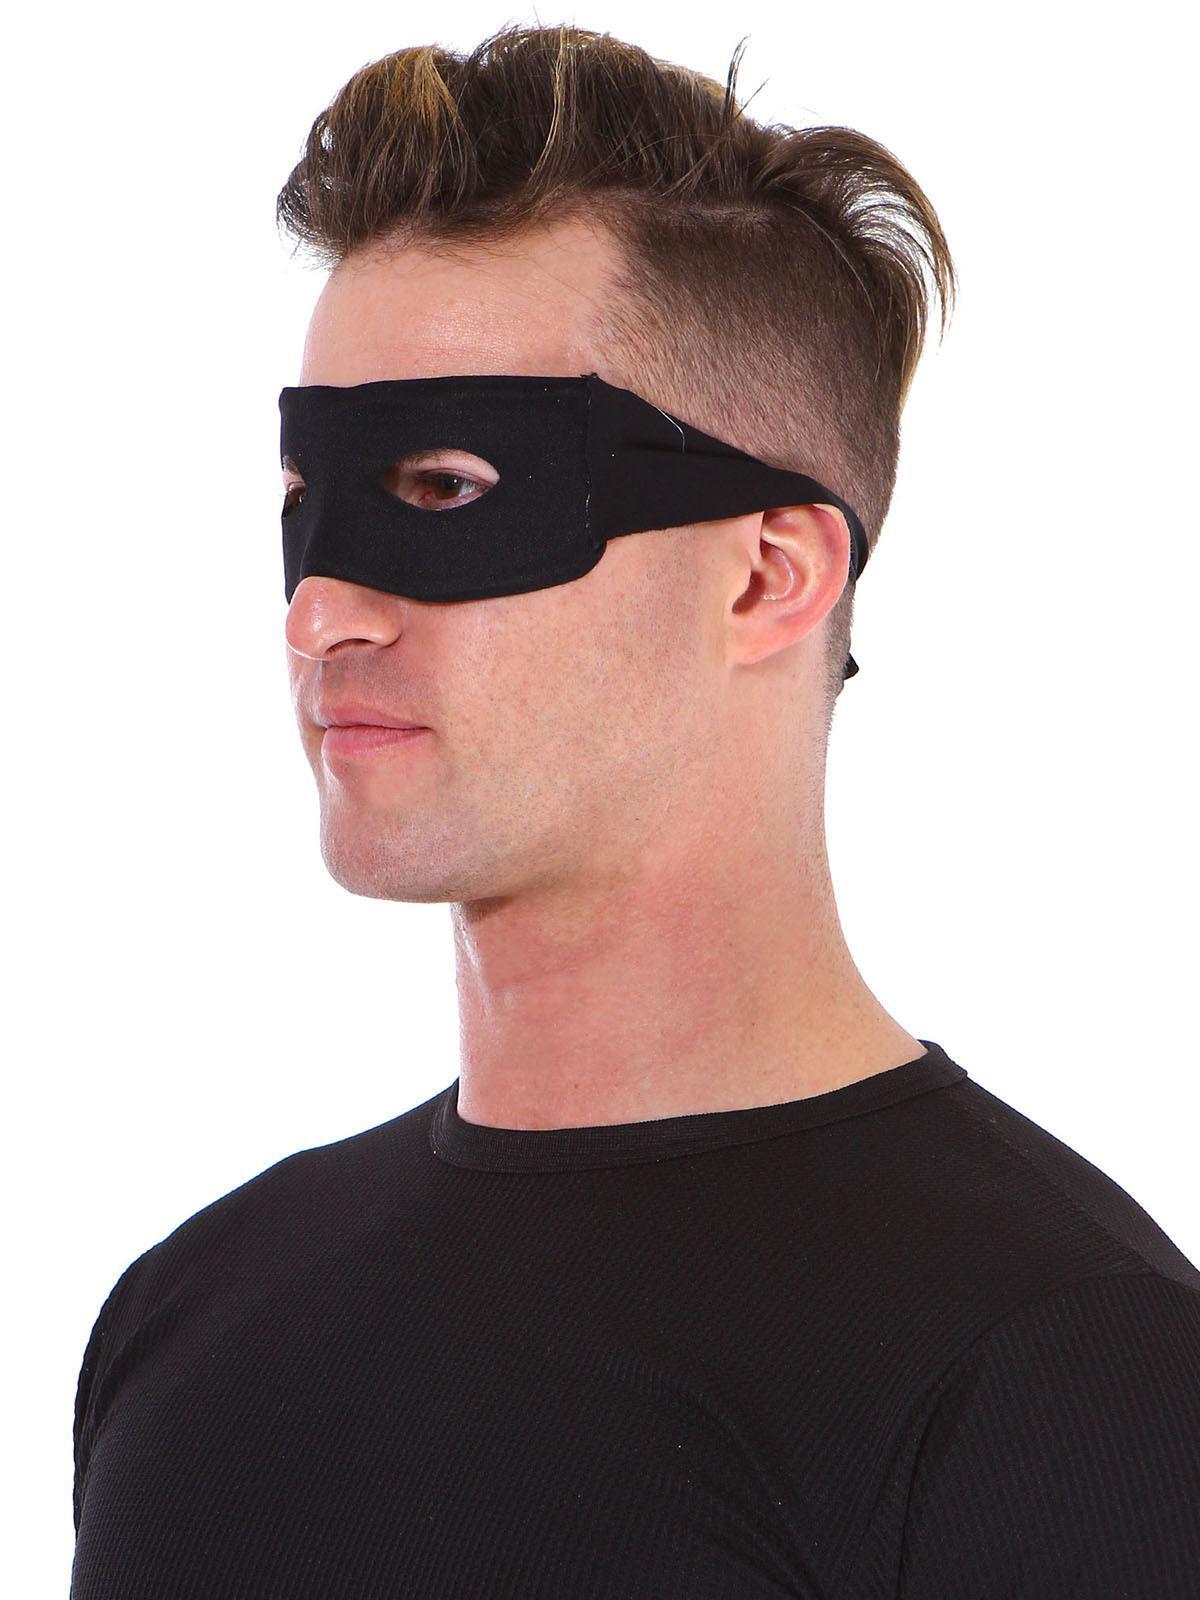 Black Eye Mask Adult Mens Eye Mask Bandit Zorro Halloween Co